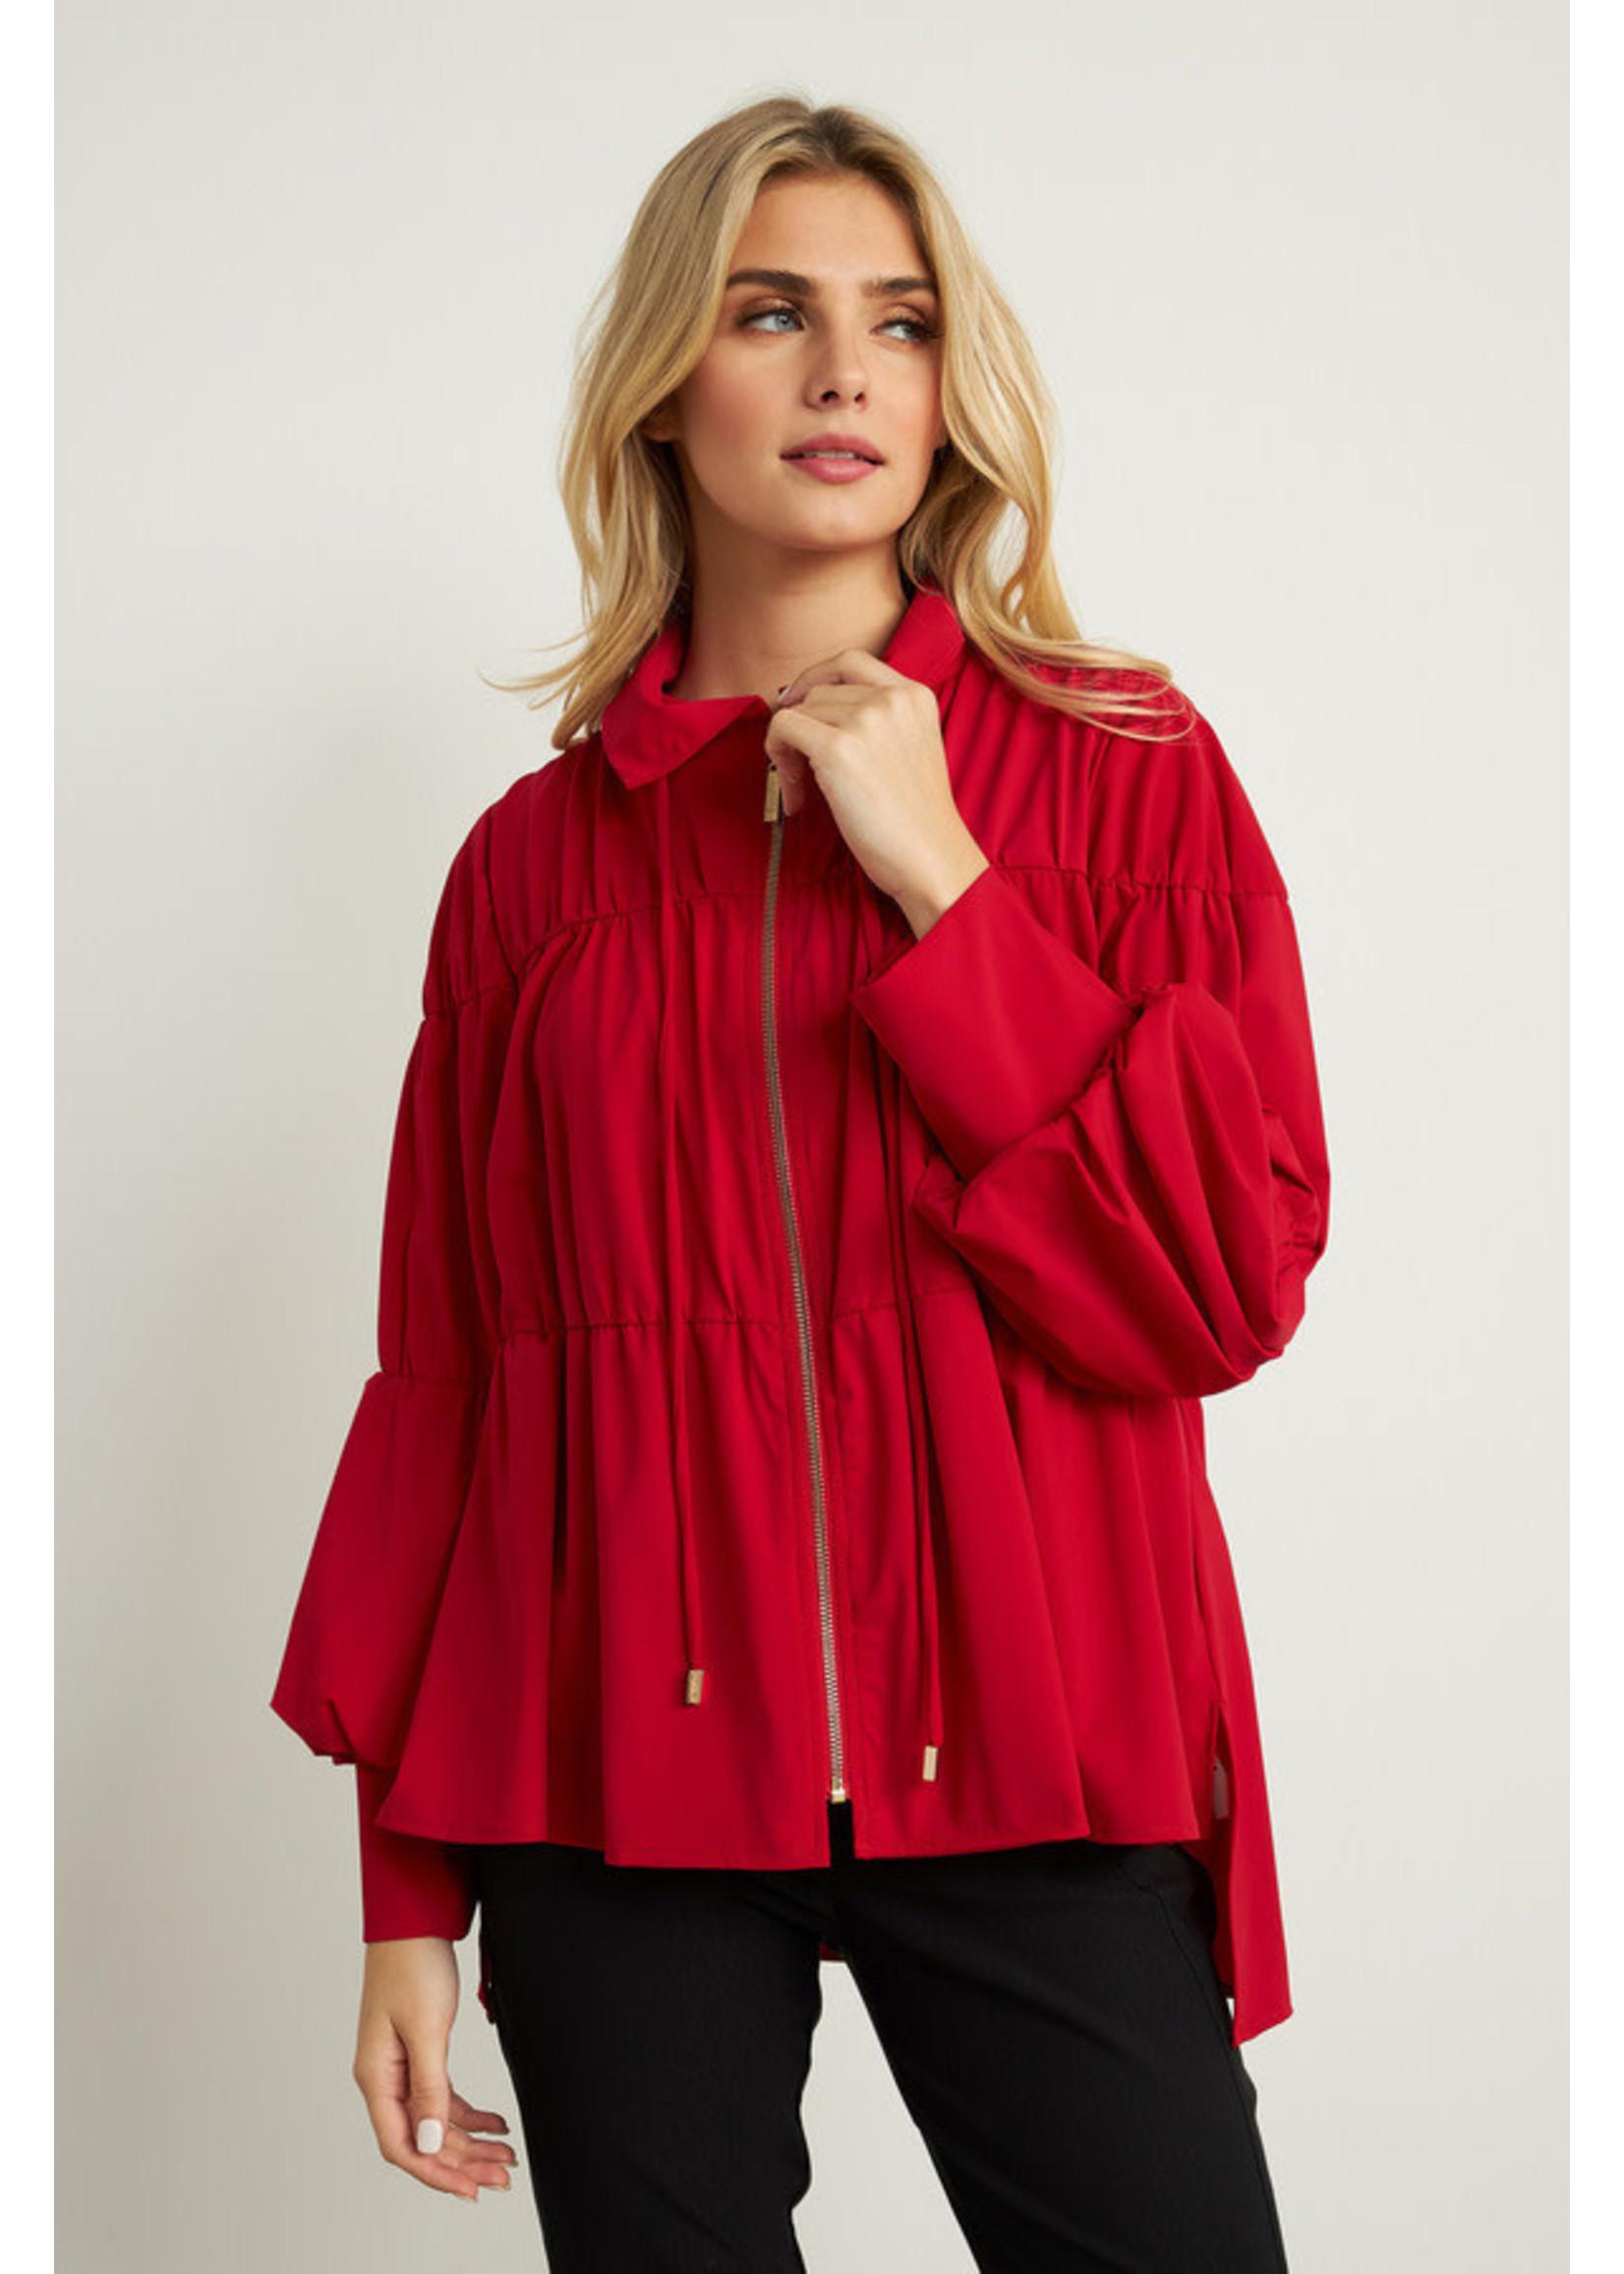 Joseph Ribkoff Red Jacket